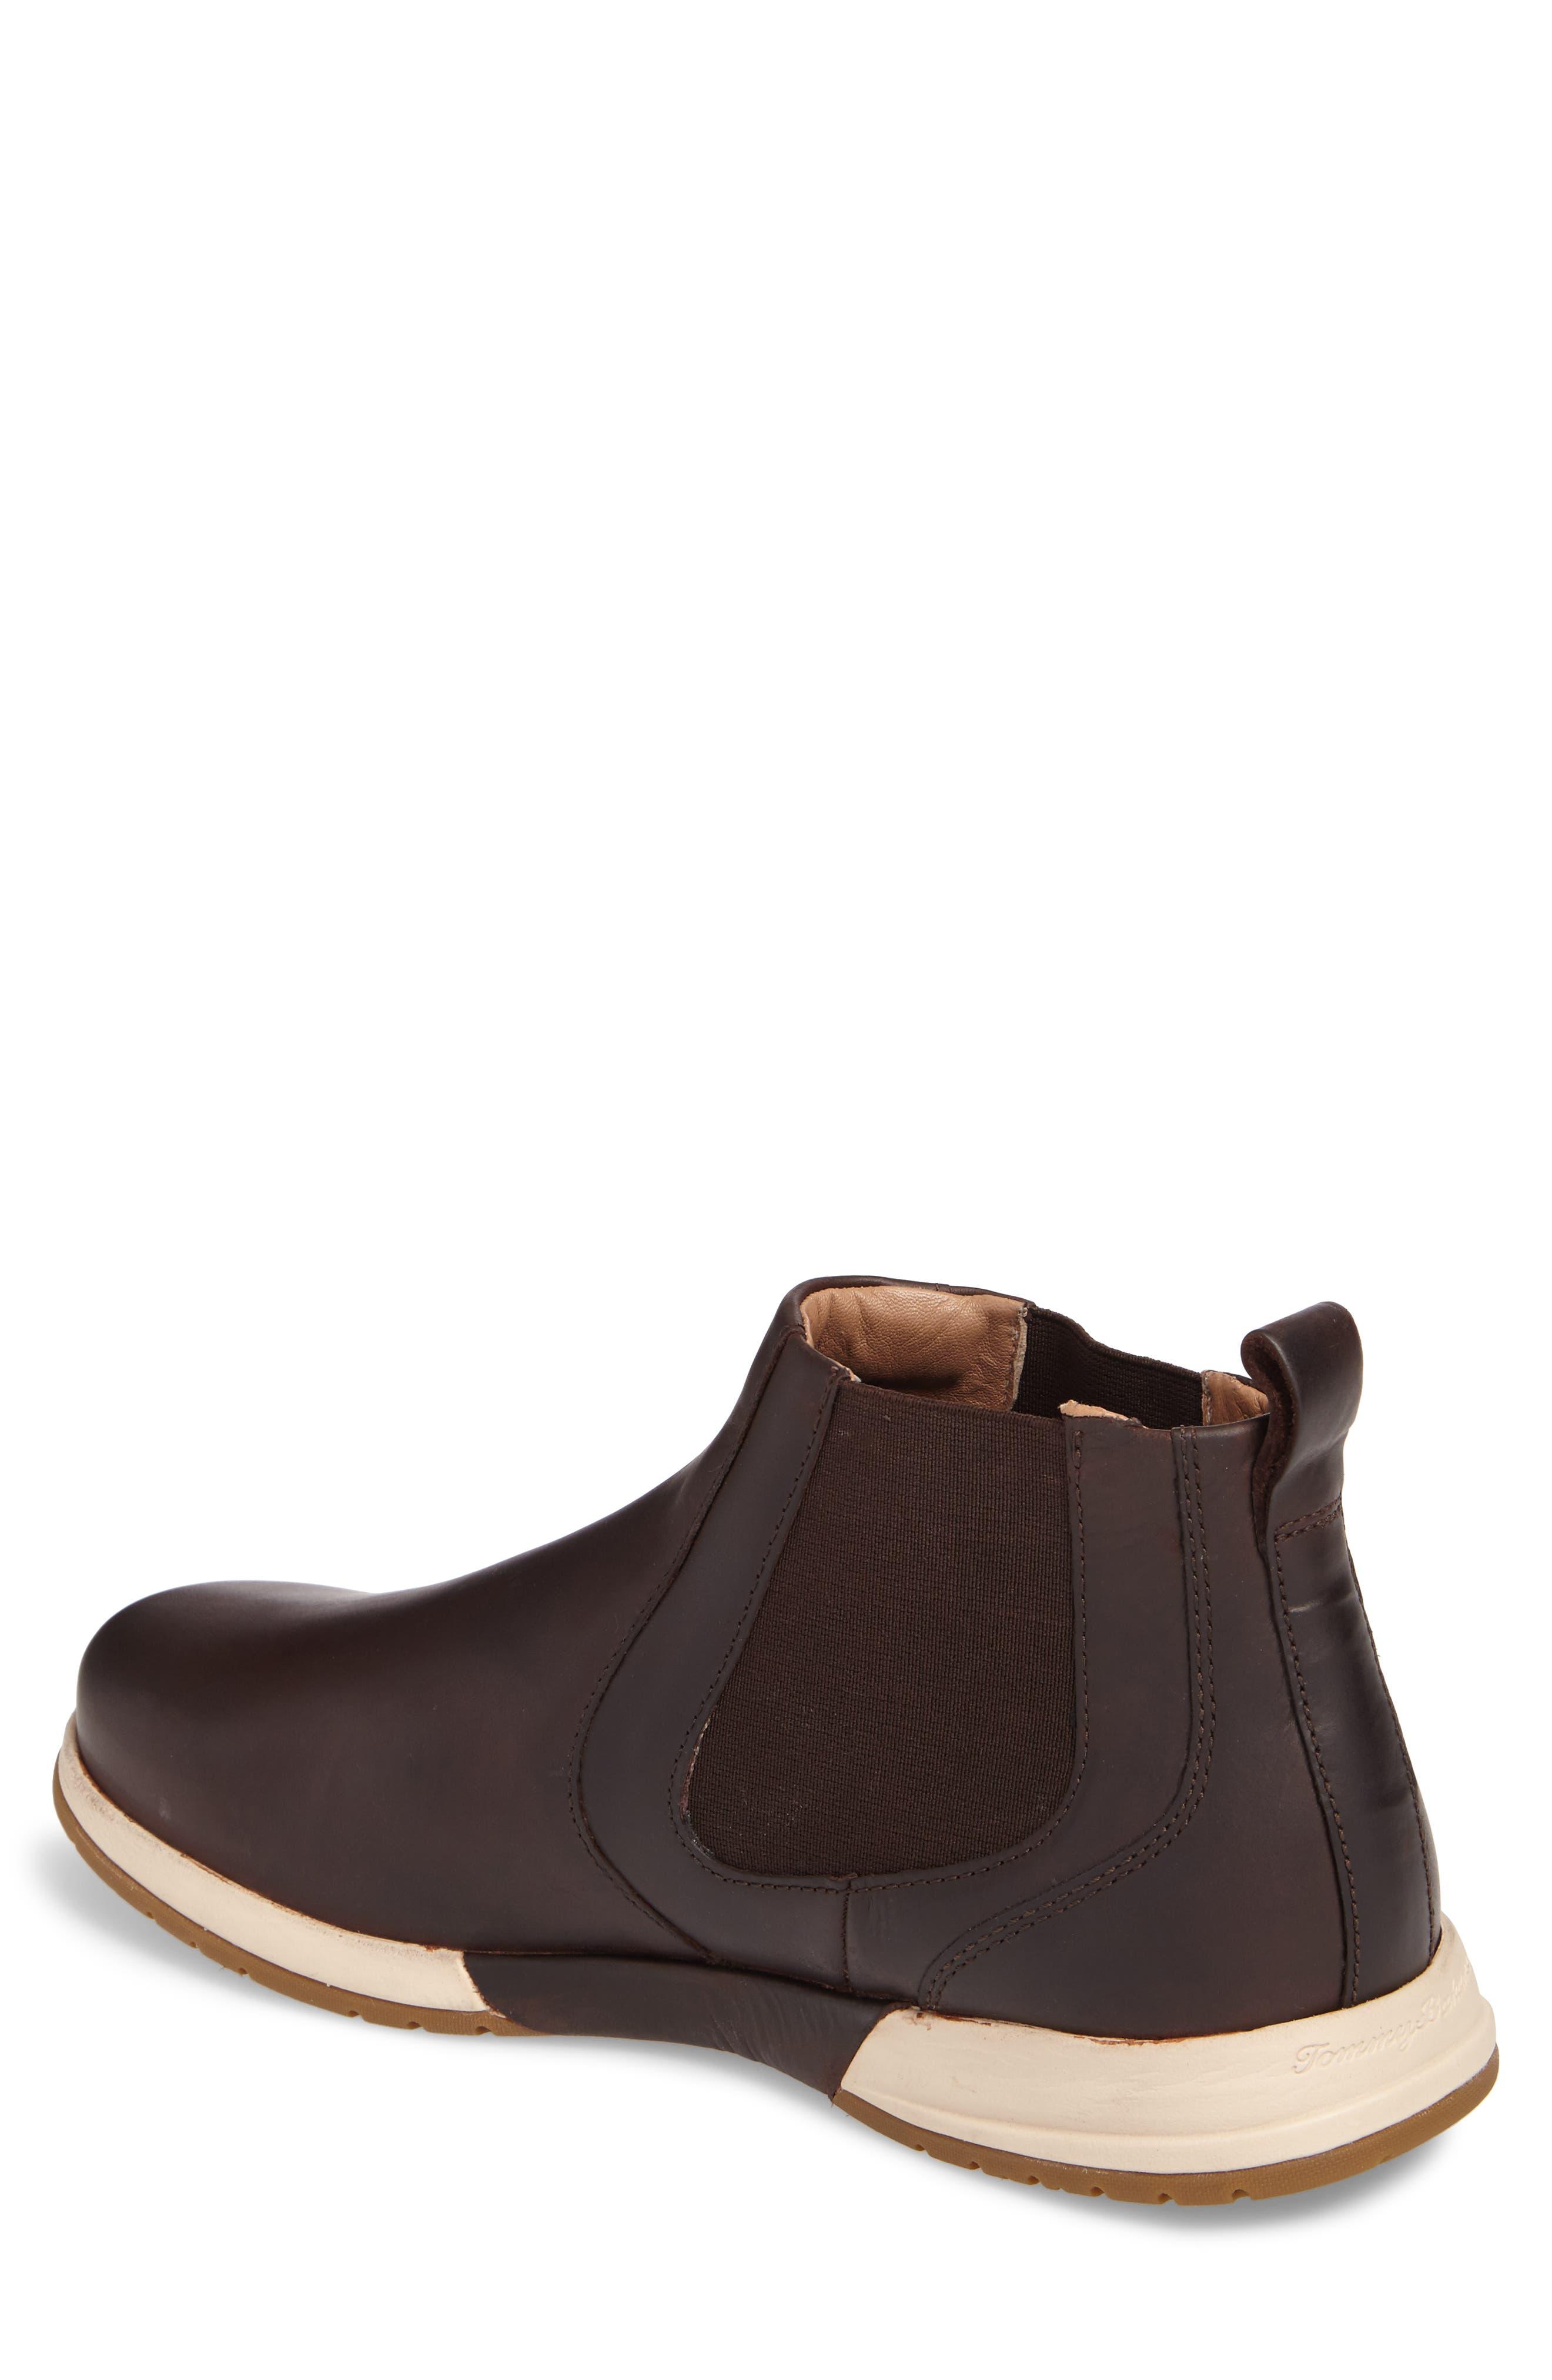 Santiago Chelsea Boot,                             Alternate thumbnail 2, color,                             Dark Brown Leather